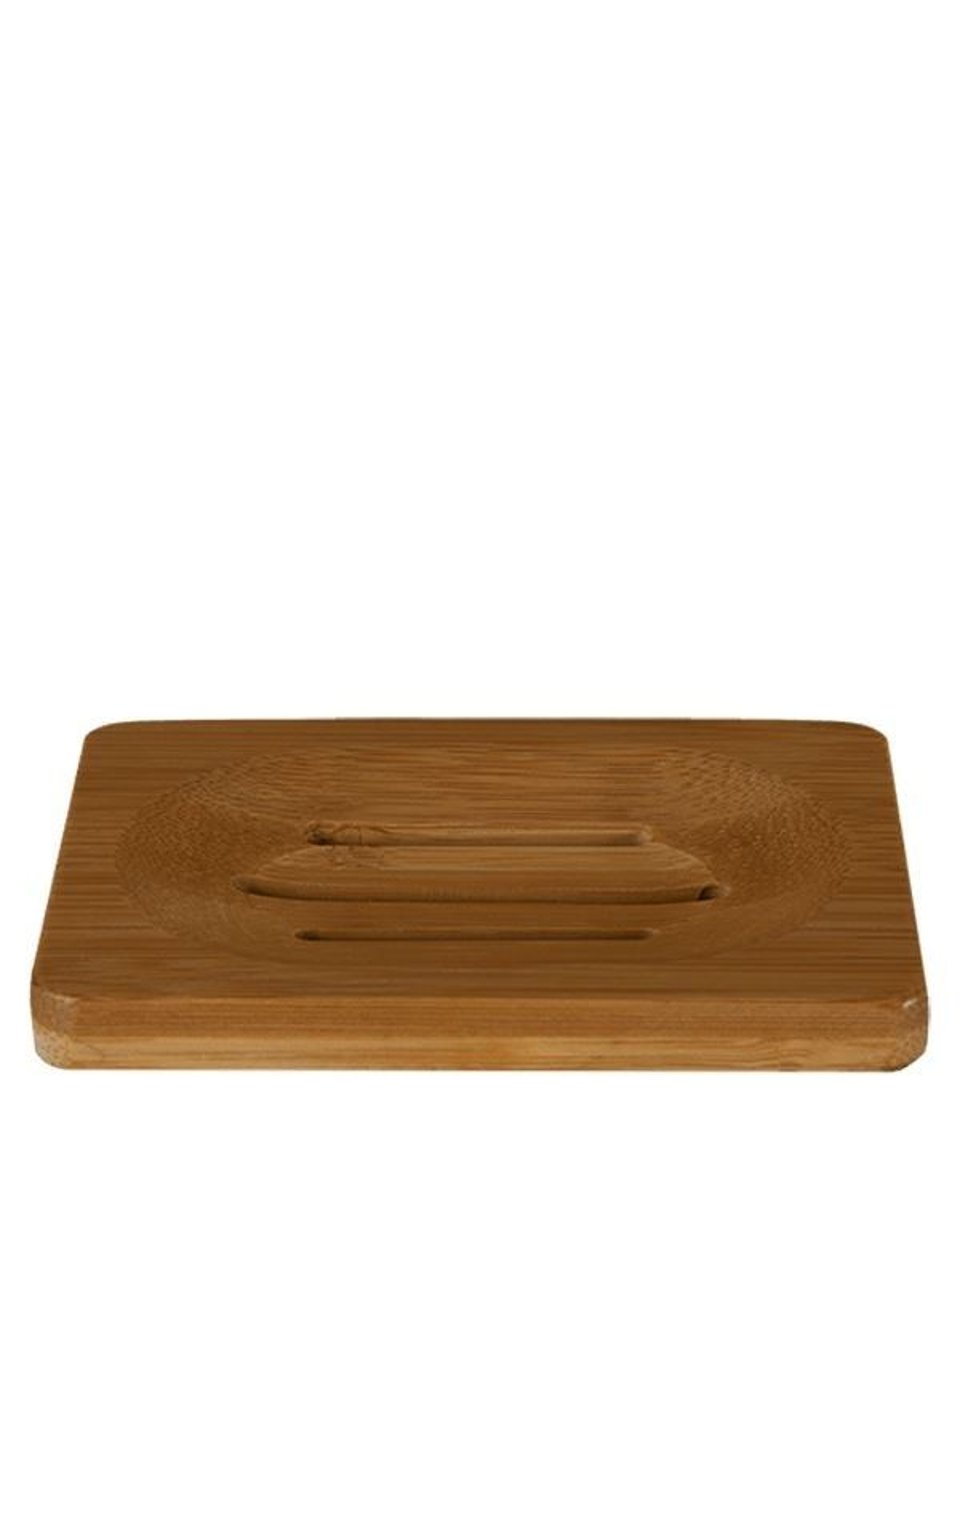 Soap Dish Bamboo 2pc